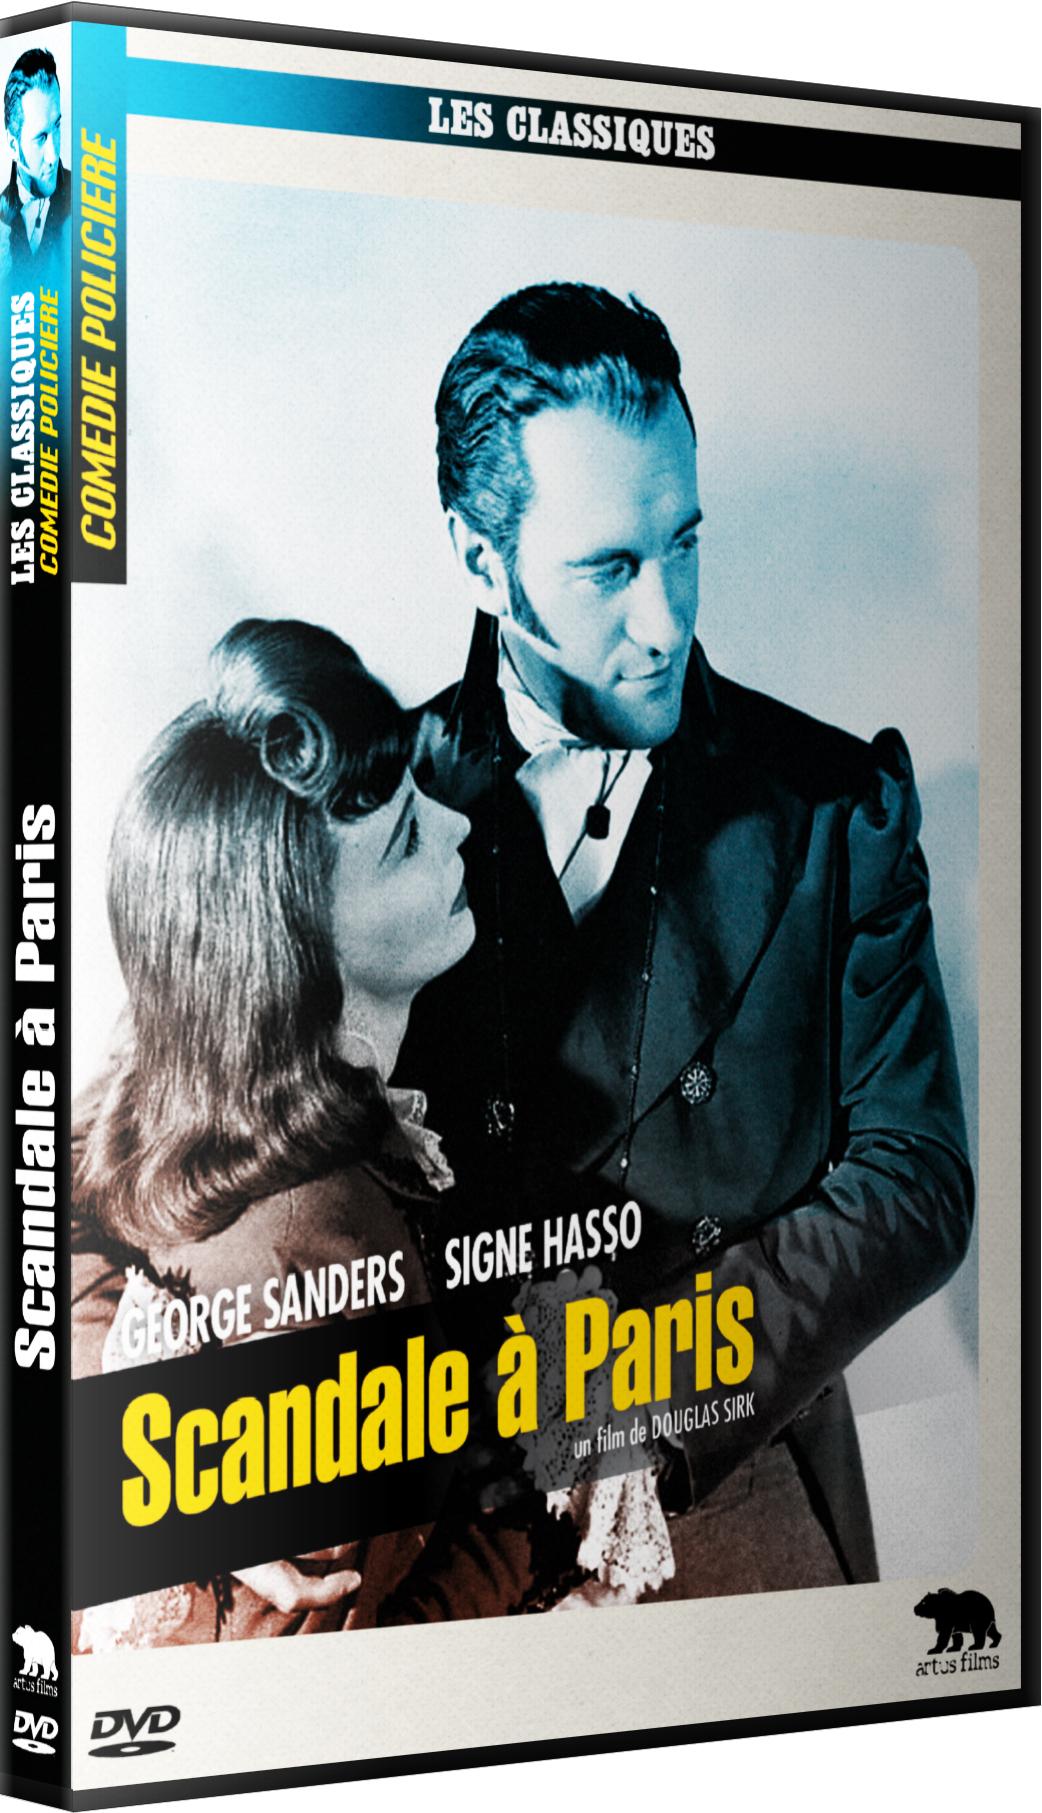 SCANDALE A PARIS - DVD